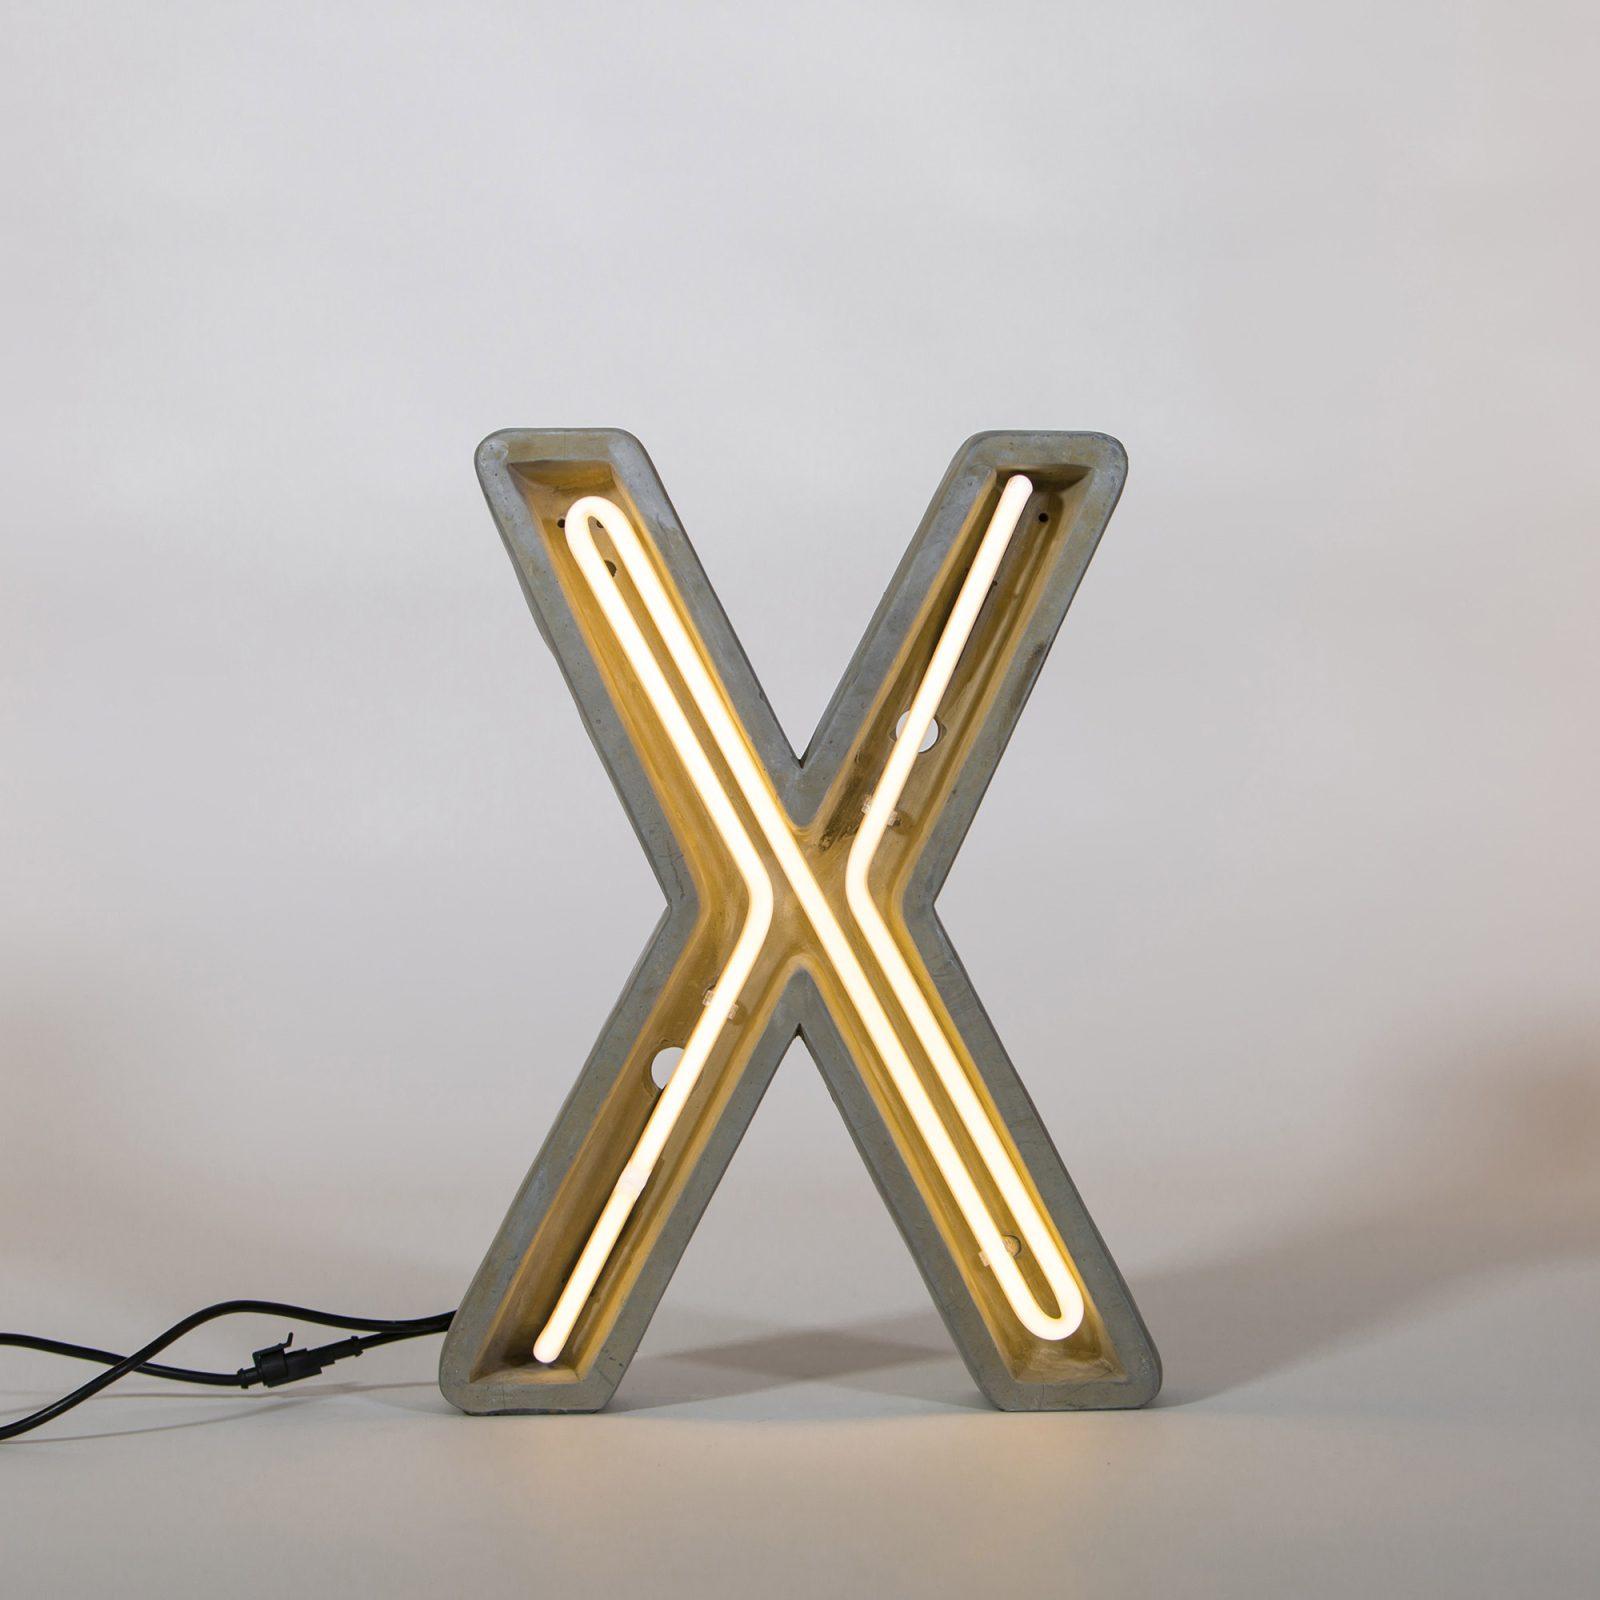 Alphacrete, Concrete Neon Light – X-32279